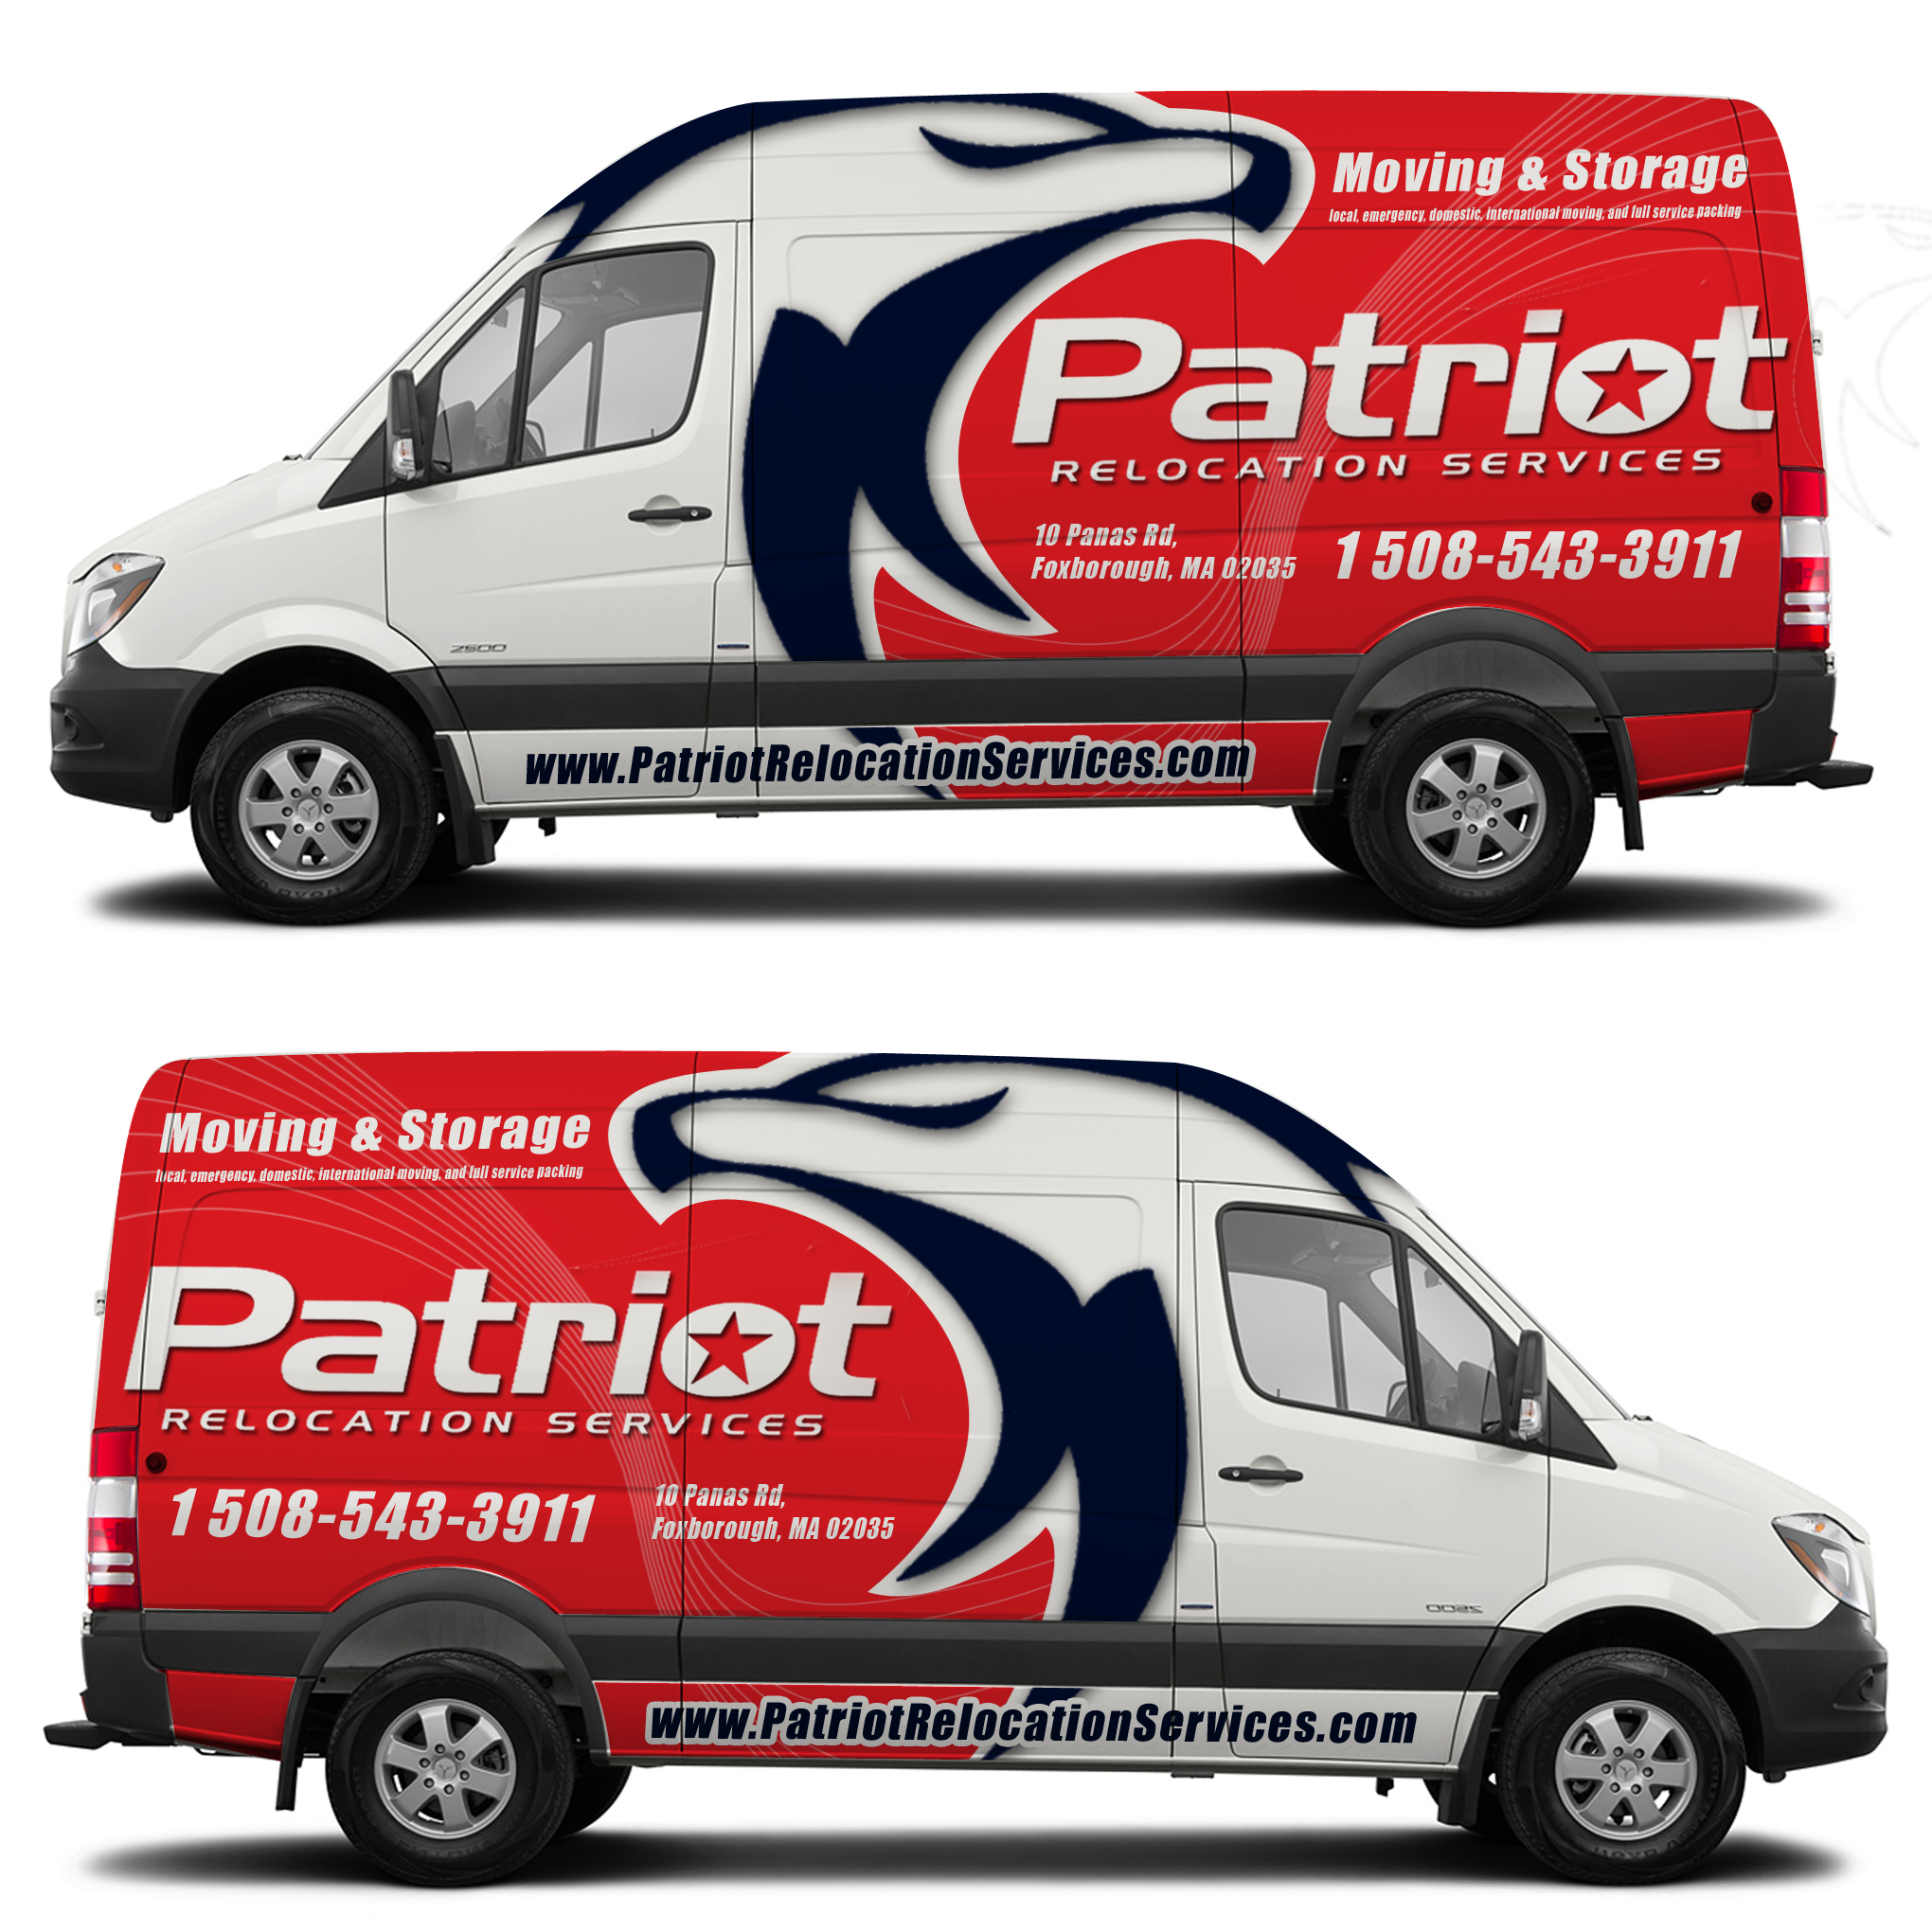 Designs high end moving company seeking truck van wrap design car truck or van wrap contest